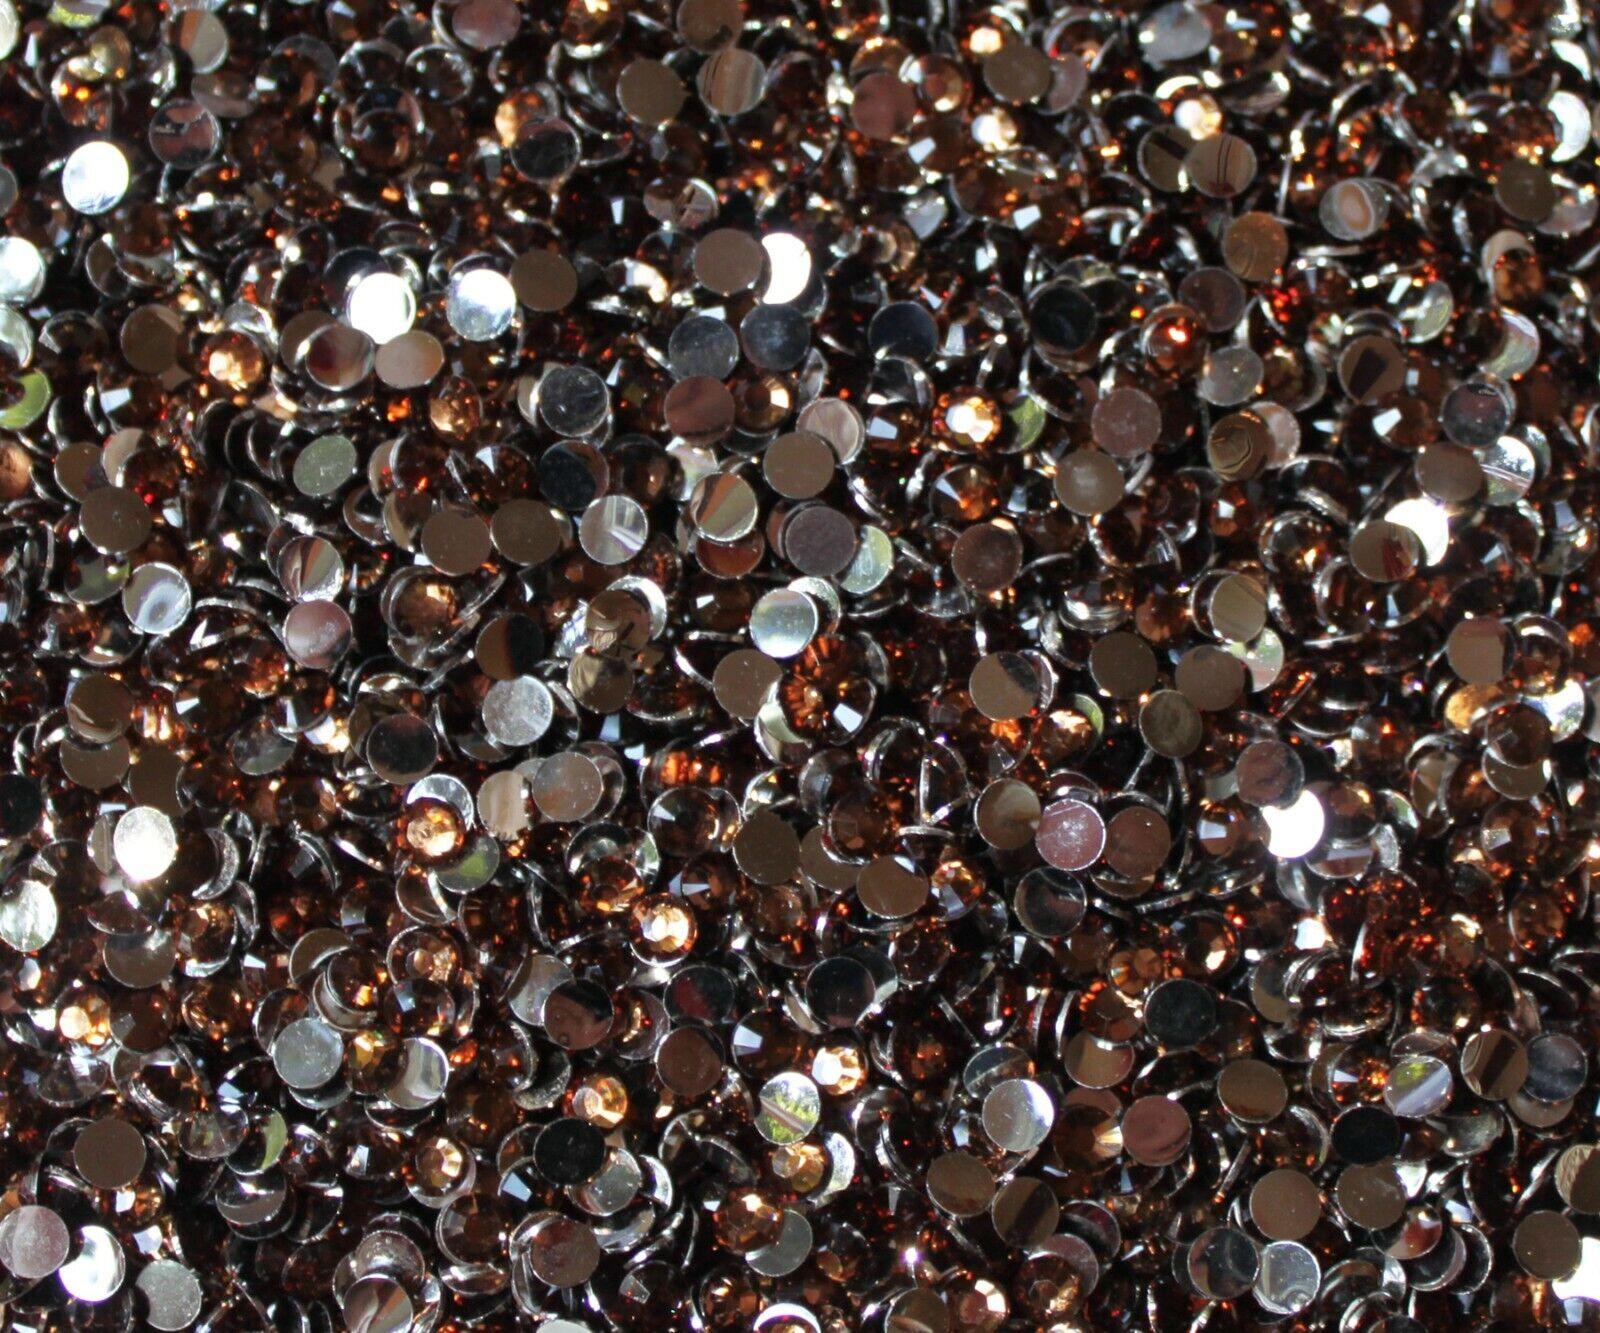 1000 Crystal Flat Back Resin Rhinestones Gems 60 colors, 2mm, 3mm, 4mm, 5mm, 6.5 SMOKY TOPAZ